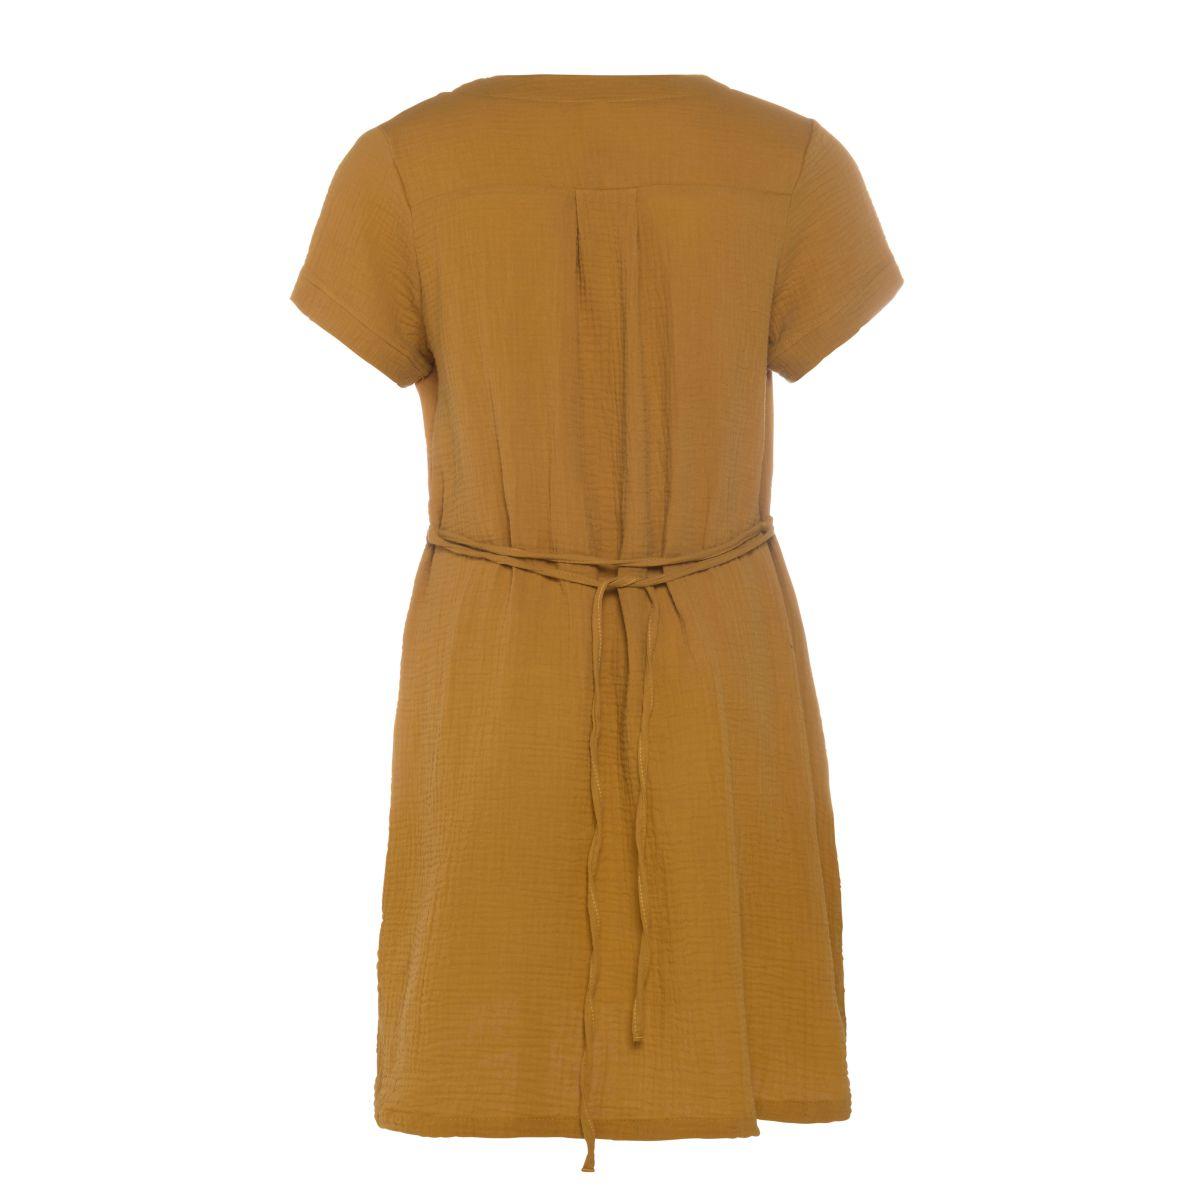 knit factory kf15012001751 indy jurk oker l 2